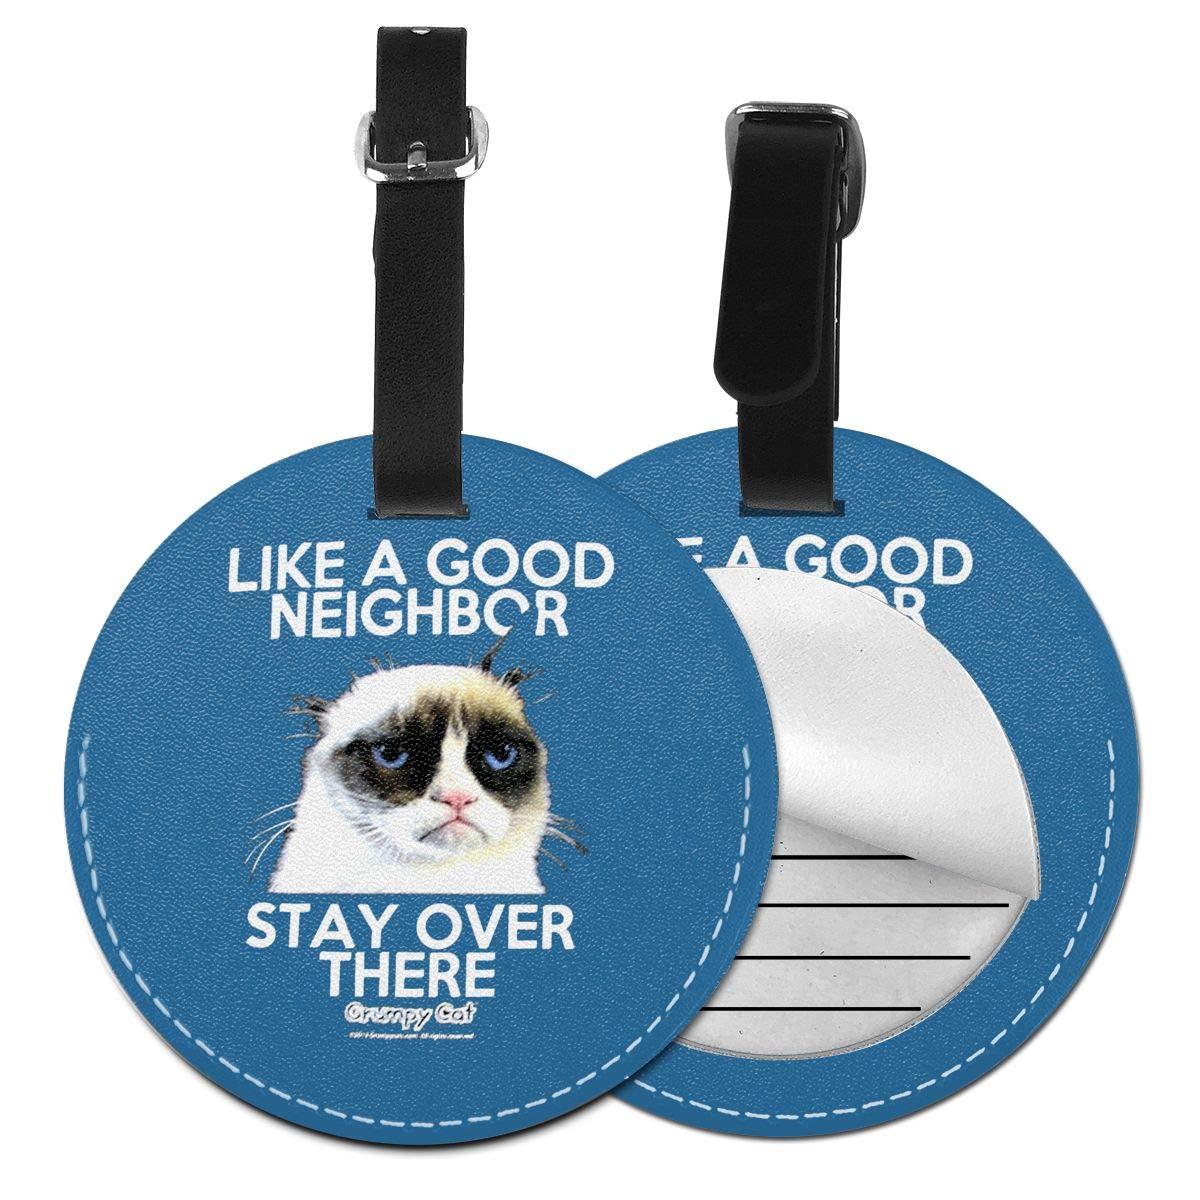 Grumpy Cat Good Neighbor Pu Leather Double Sides Print Round Luggage Tag Mutilple Packs 1pcs,2pcs,4pcs